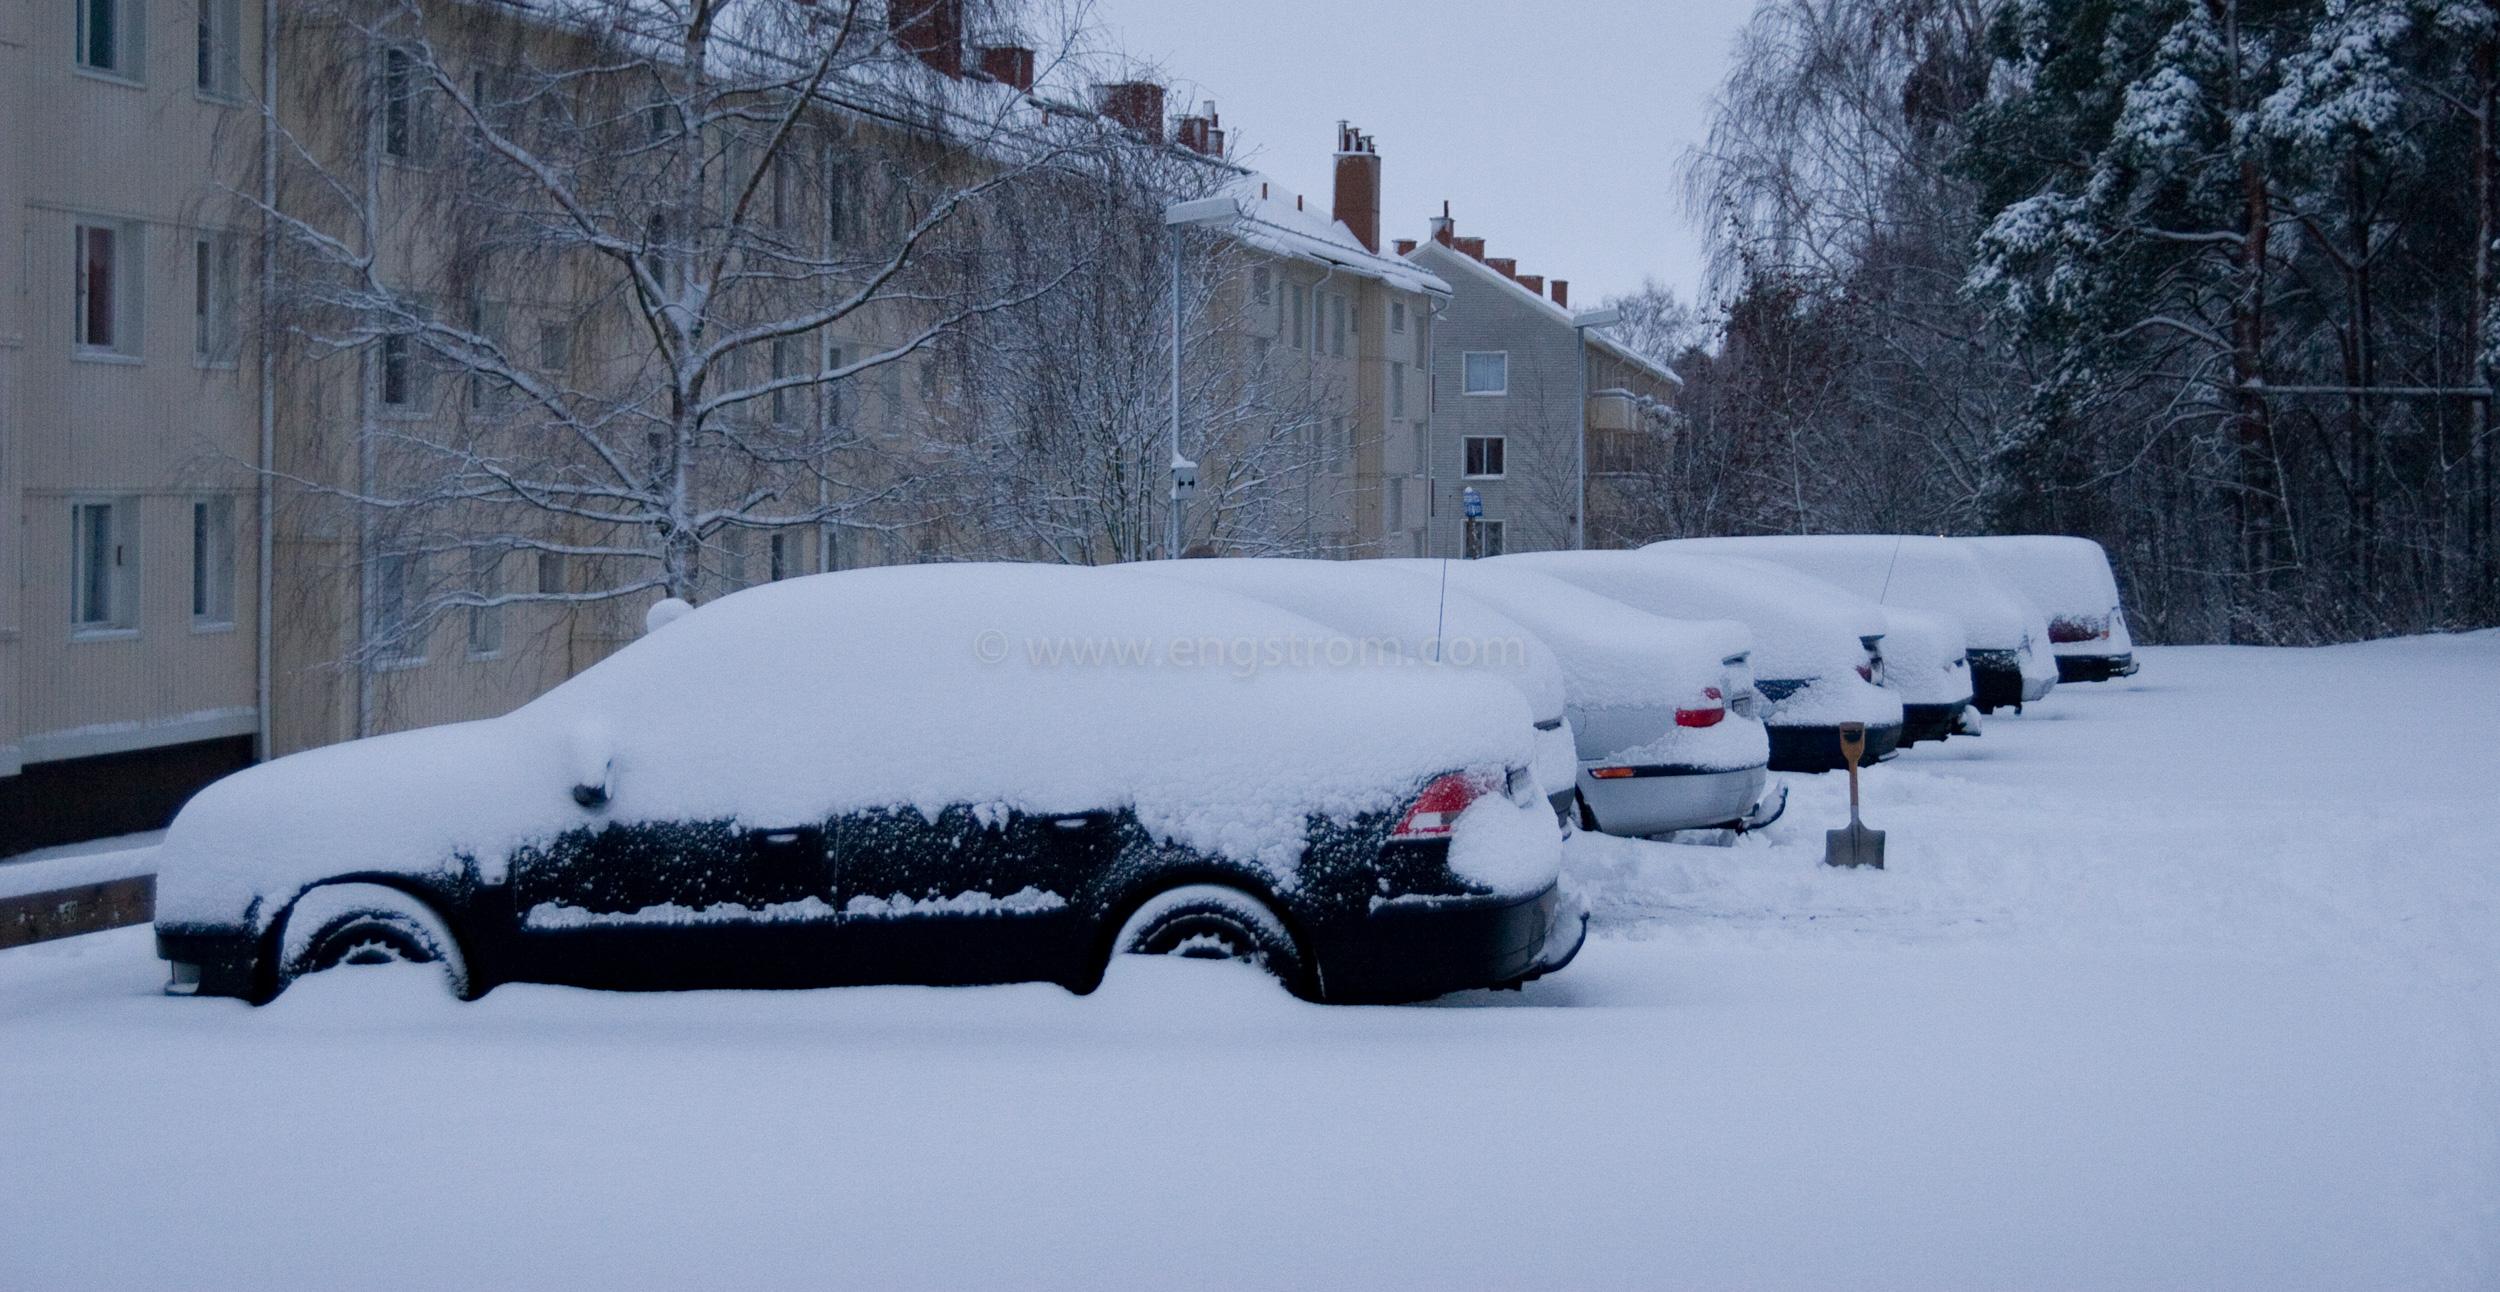 JE-0228, Översnöade bilar, Jonas Engström